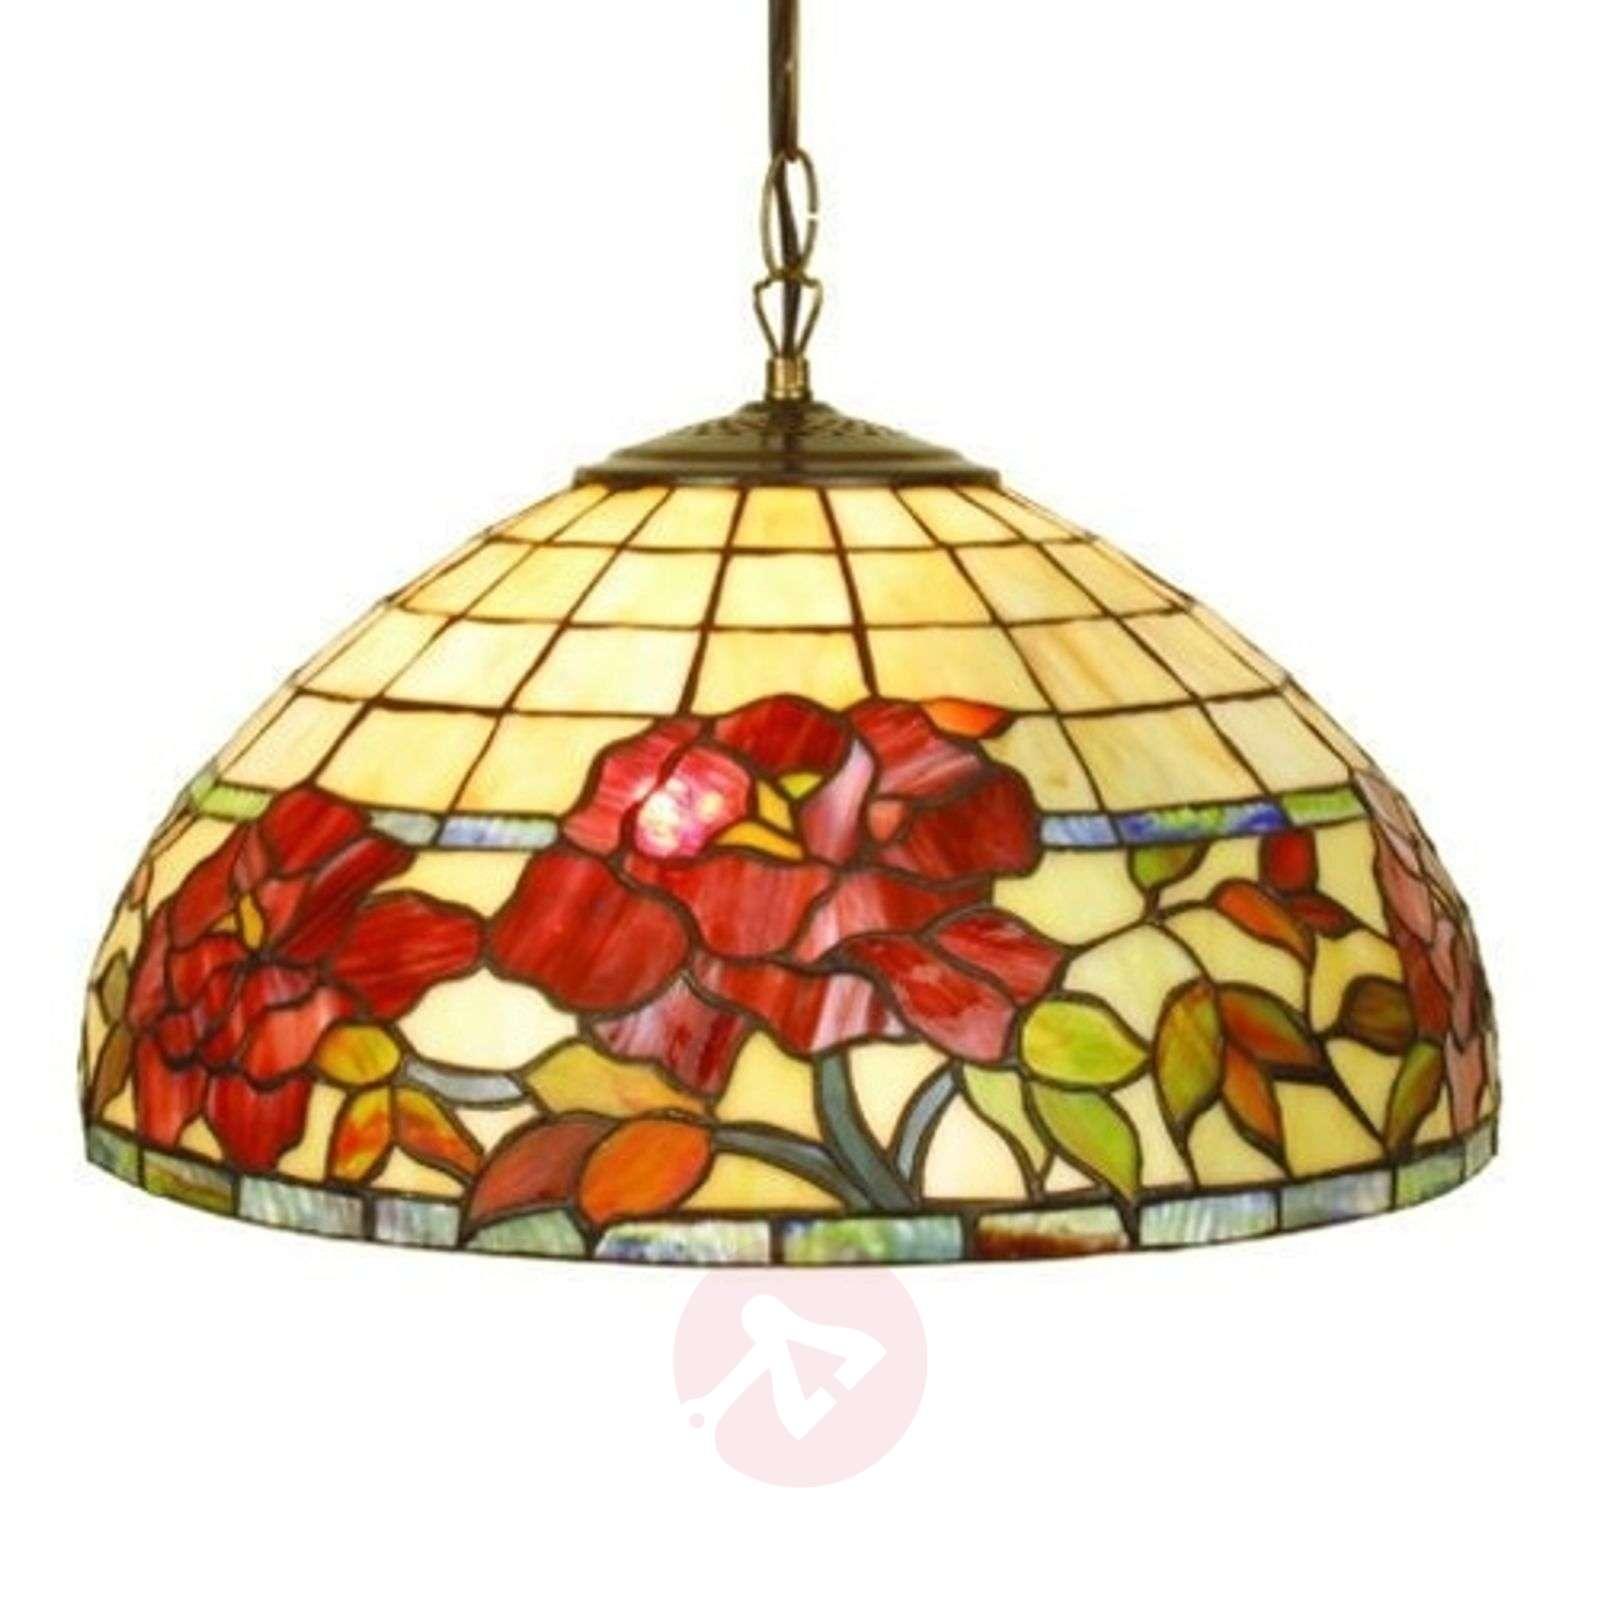 ESMEE ornate hanging light-1032172X-01